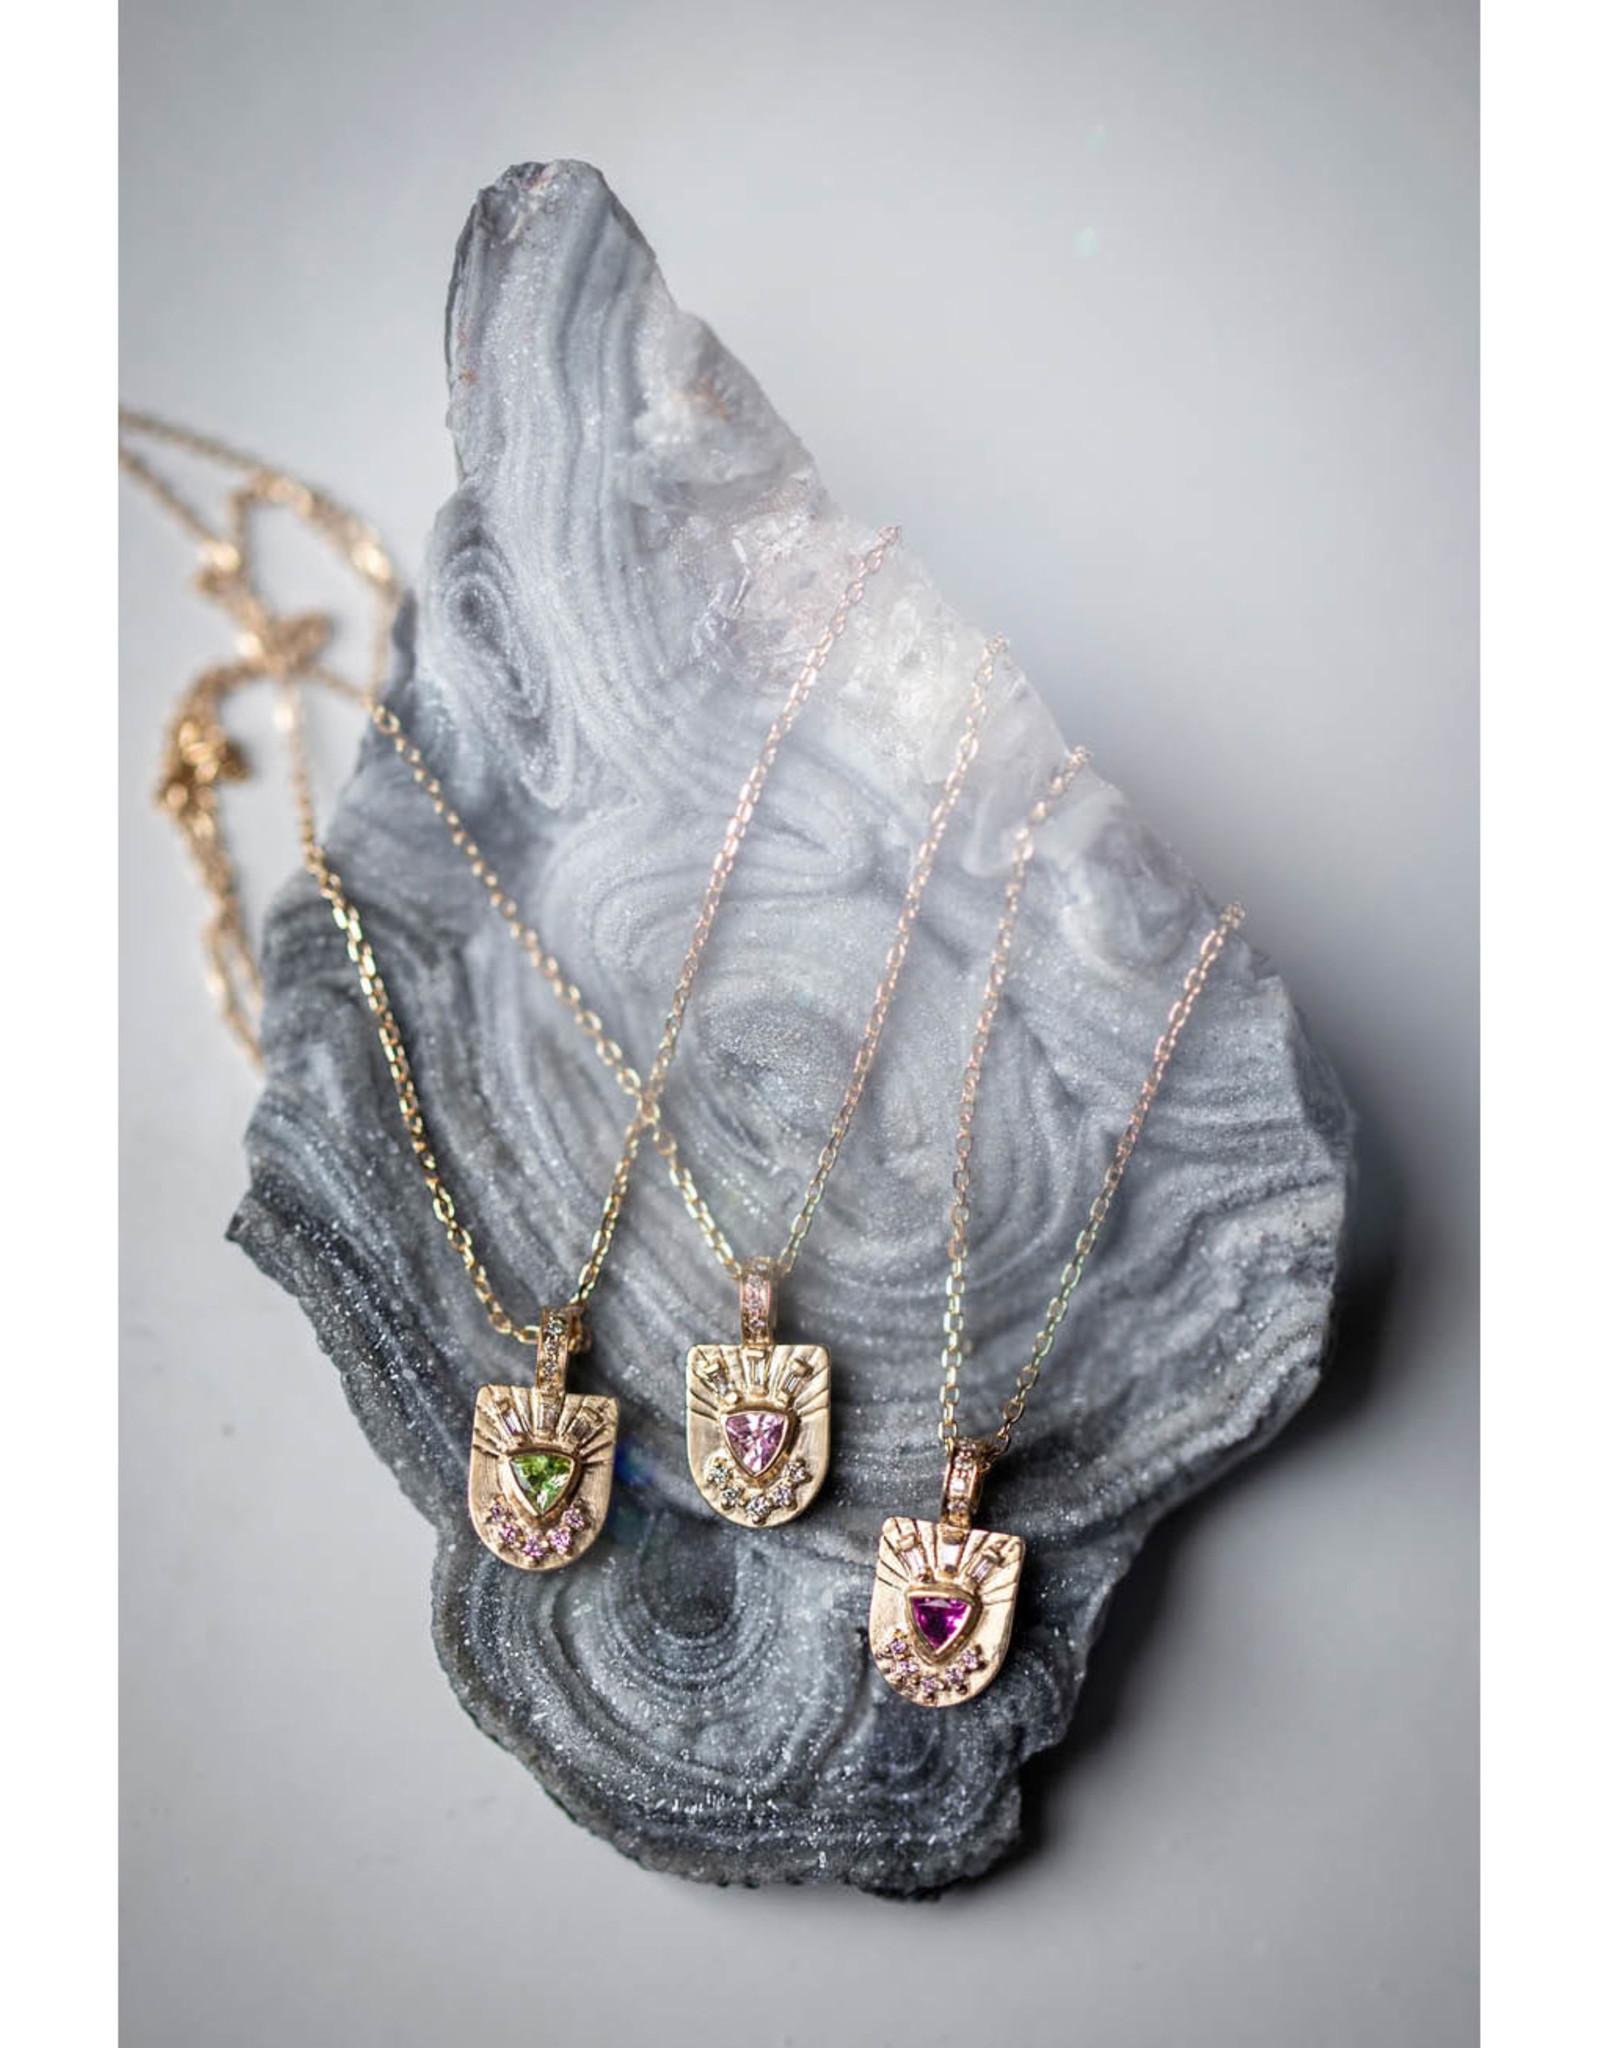 Celine Daoust Little Totem Necklace - Light Pink Tourmaline + Diamonds